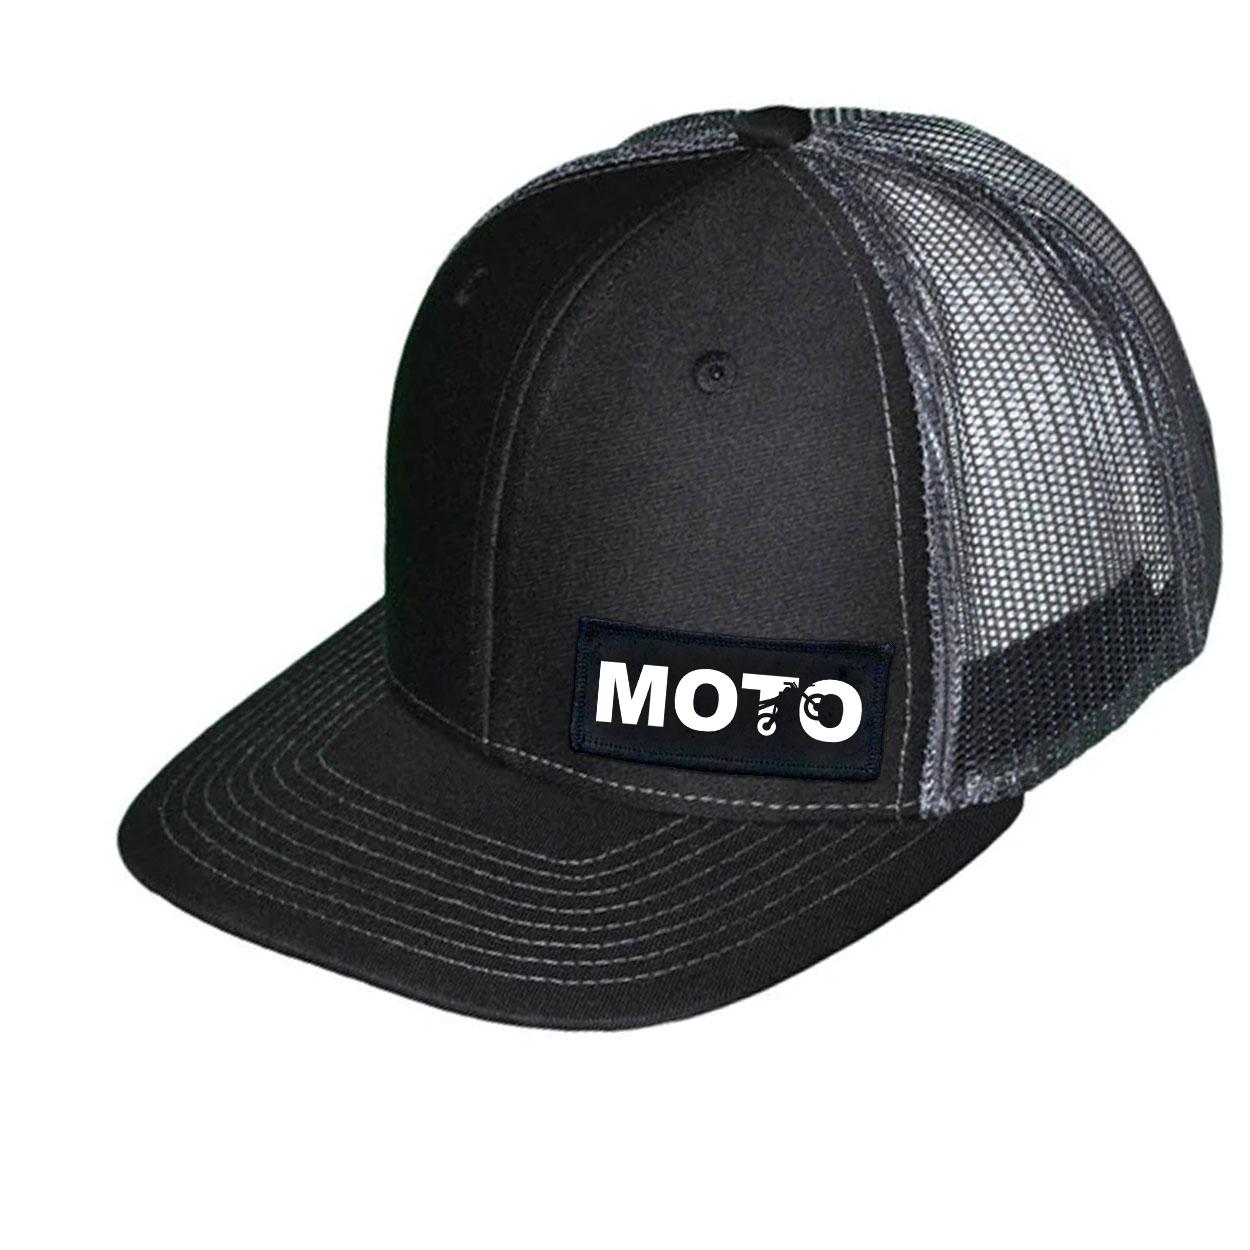 Moto Wheelie Logo Night Out Woven Patch Snapback Trucker Hat Black/Dark Gray (White Logo)